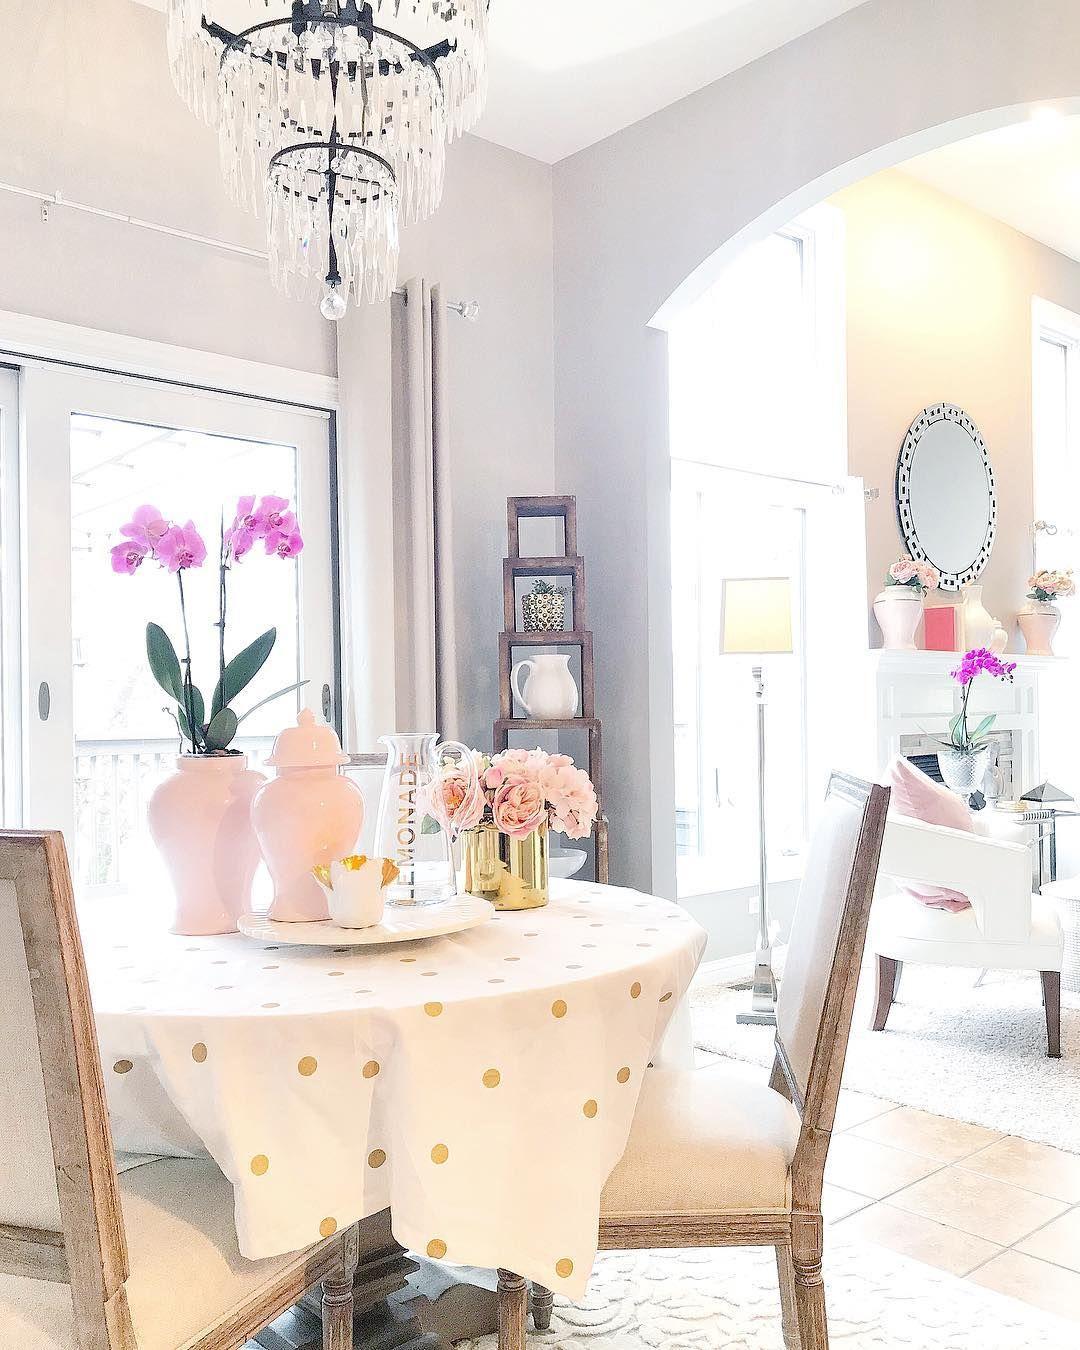 lo home pink ginger jar kitchen decor kitchen decor inspiration kitchen decor home goods on kitchen decor pink id=97838